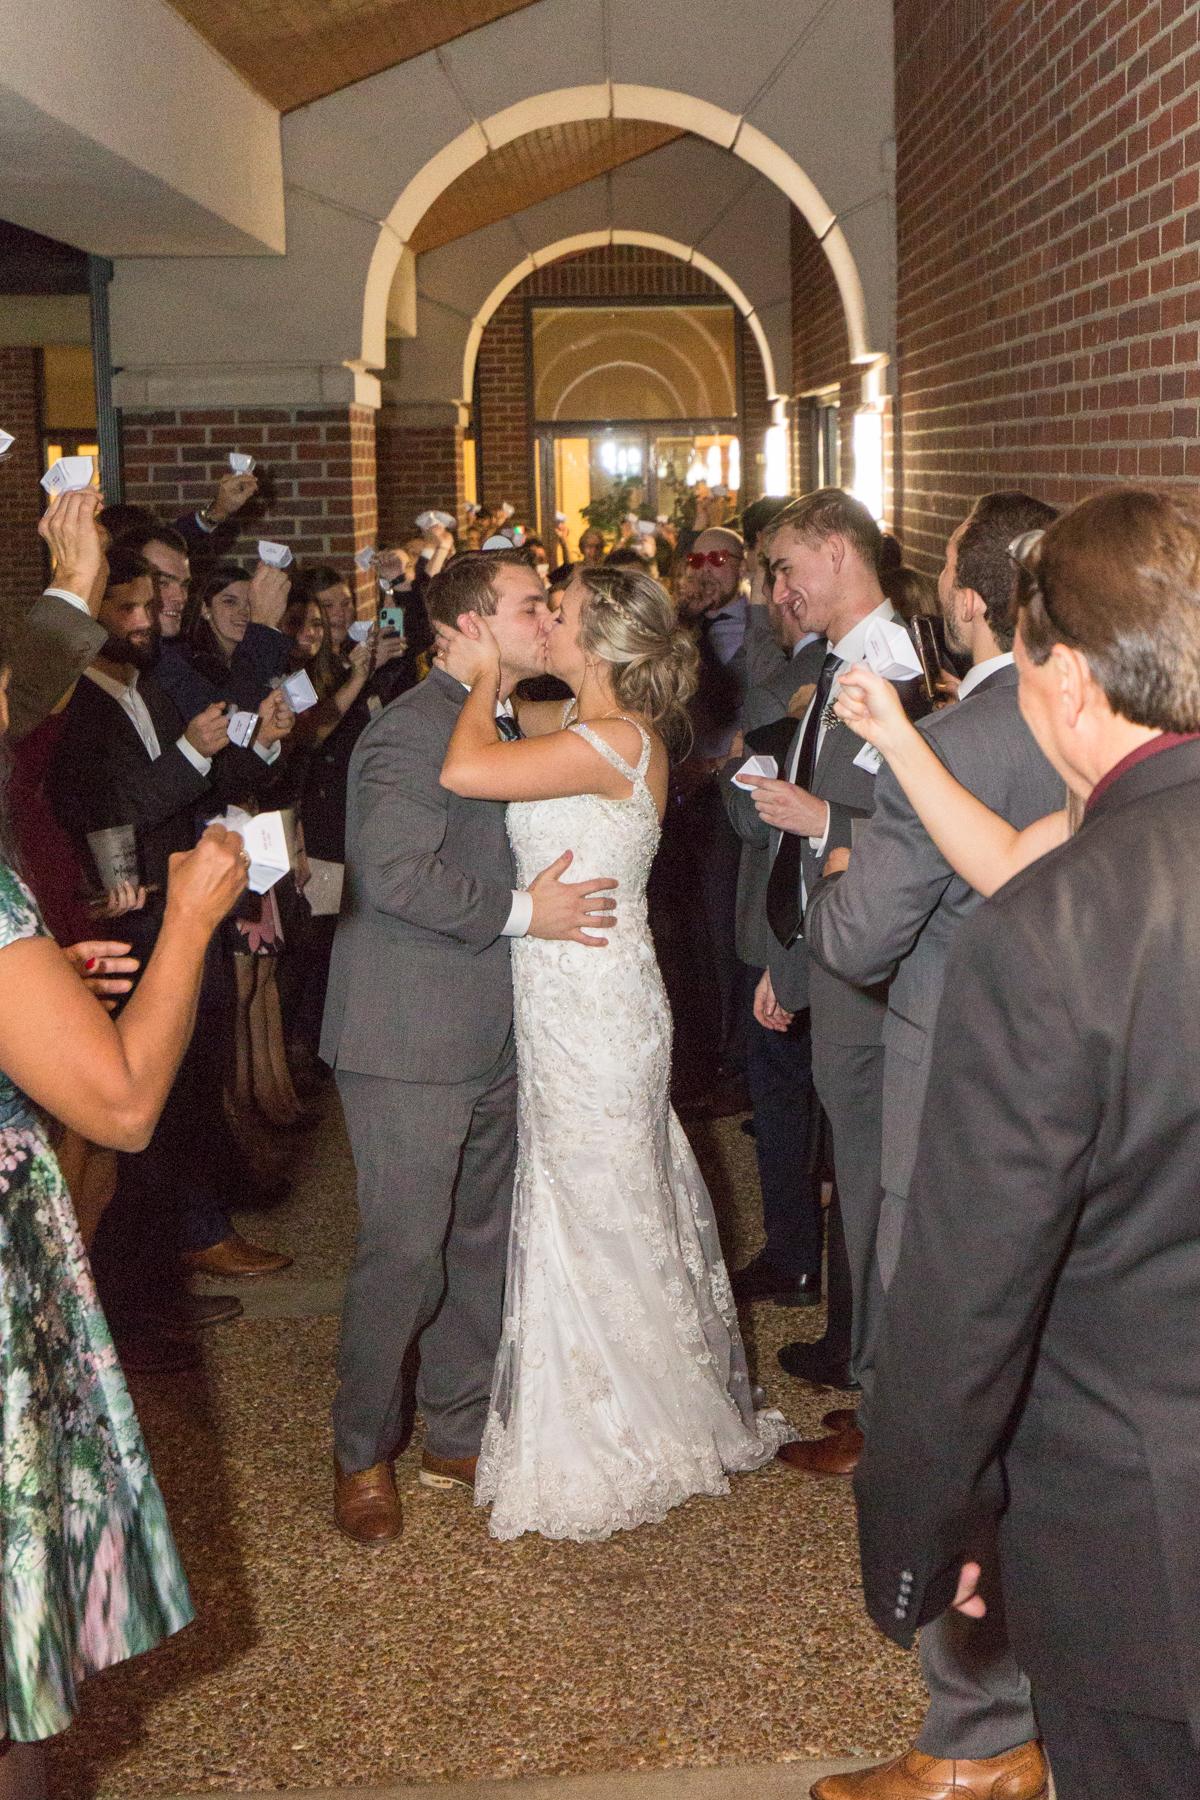 Kelli-and-Matt-Nashville-Wedding-Sneak-Peak-0319.jpg